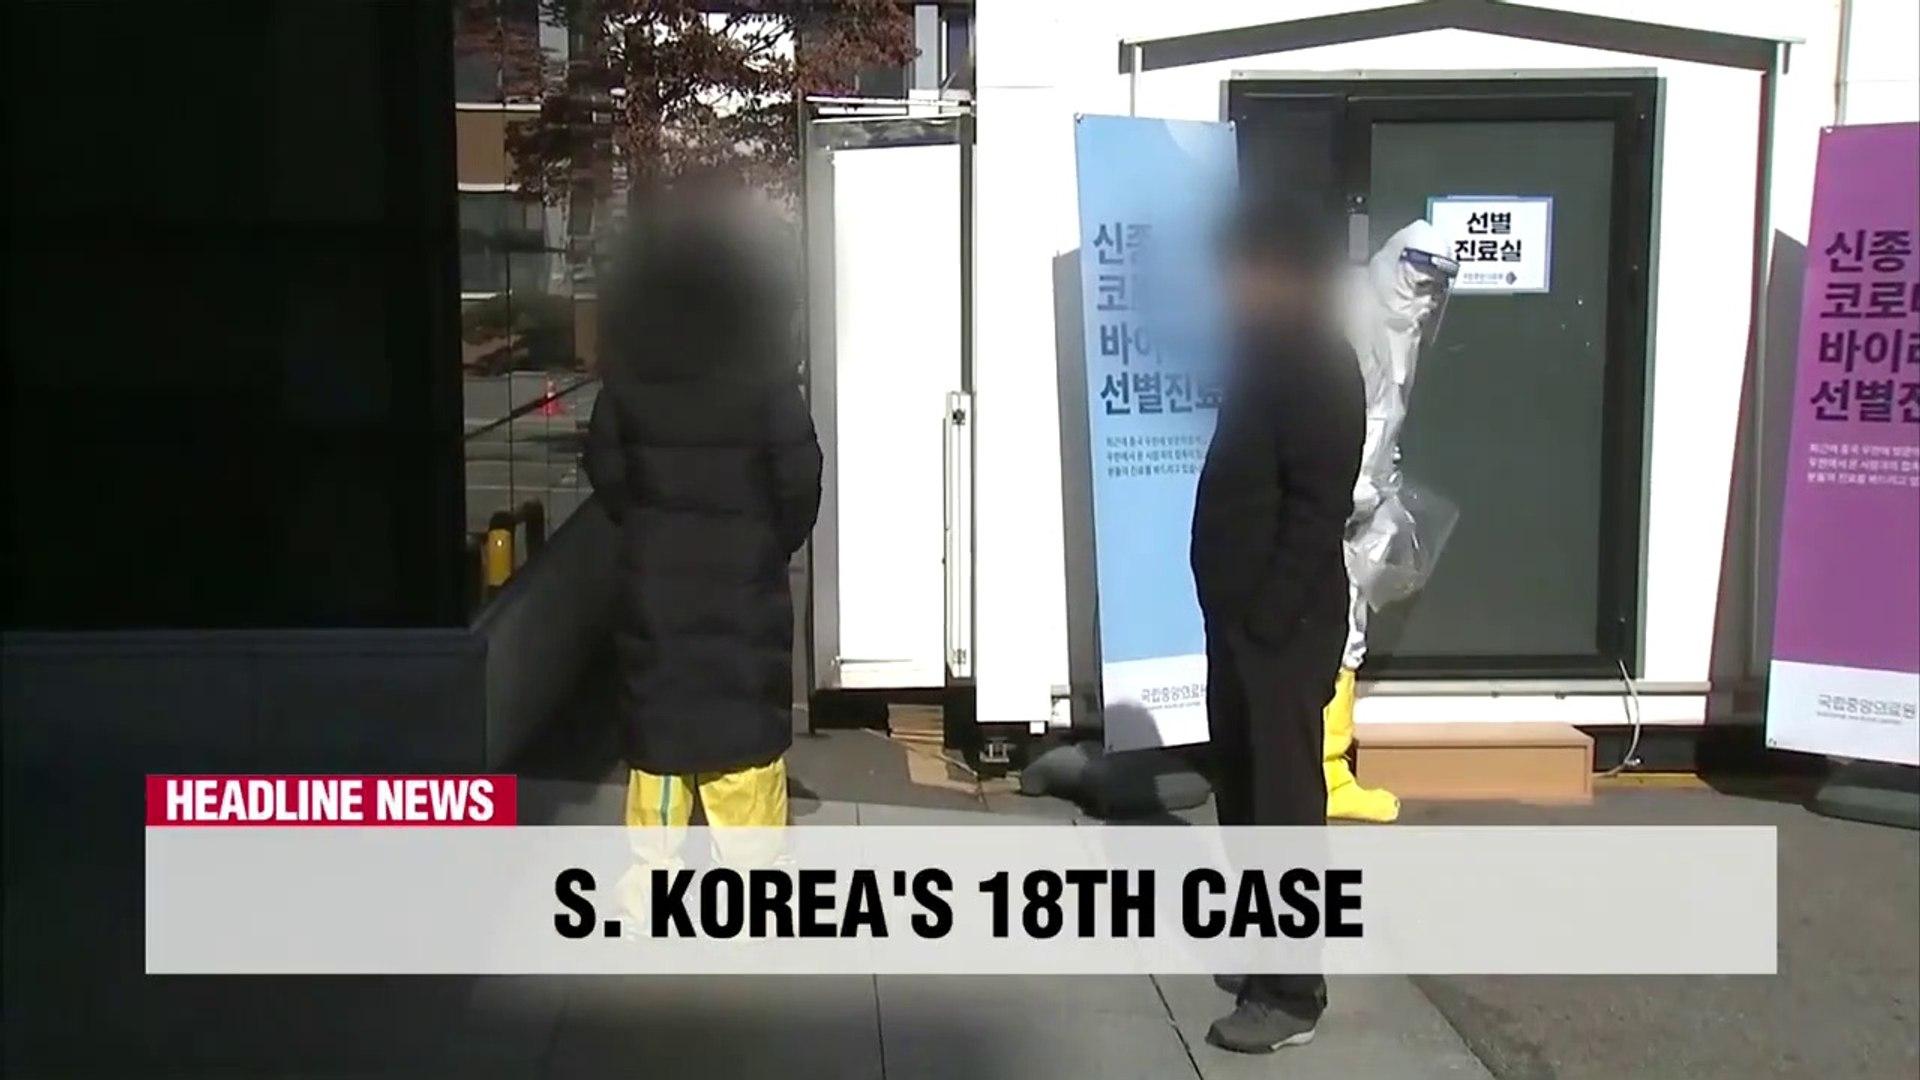 ARIRANG NEWS [FULL]- New coronavirus in South Korea; 2 more patients confirmed, total rises to 18